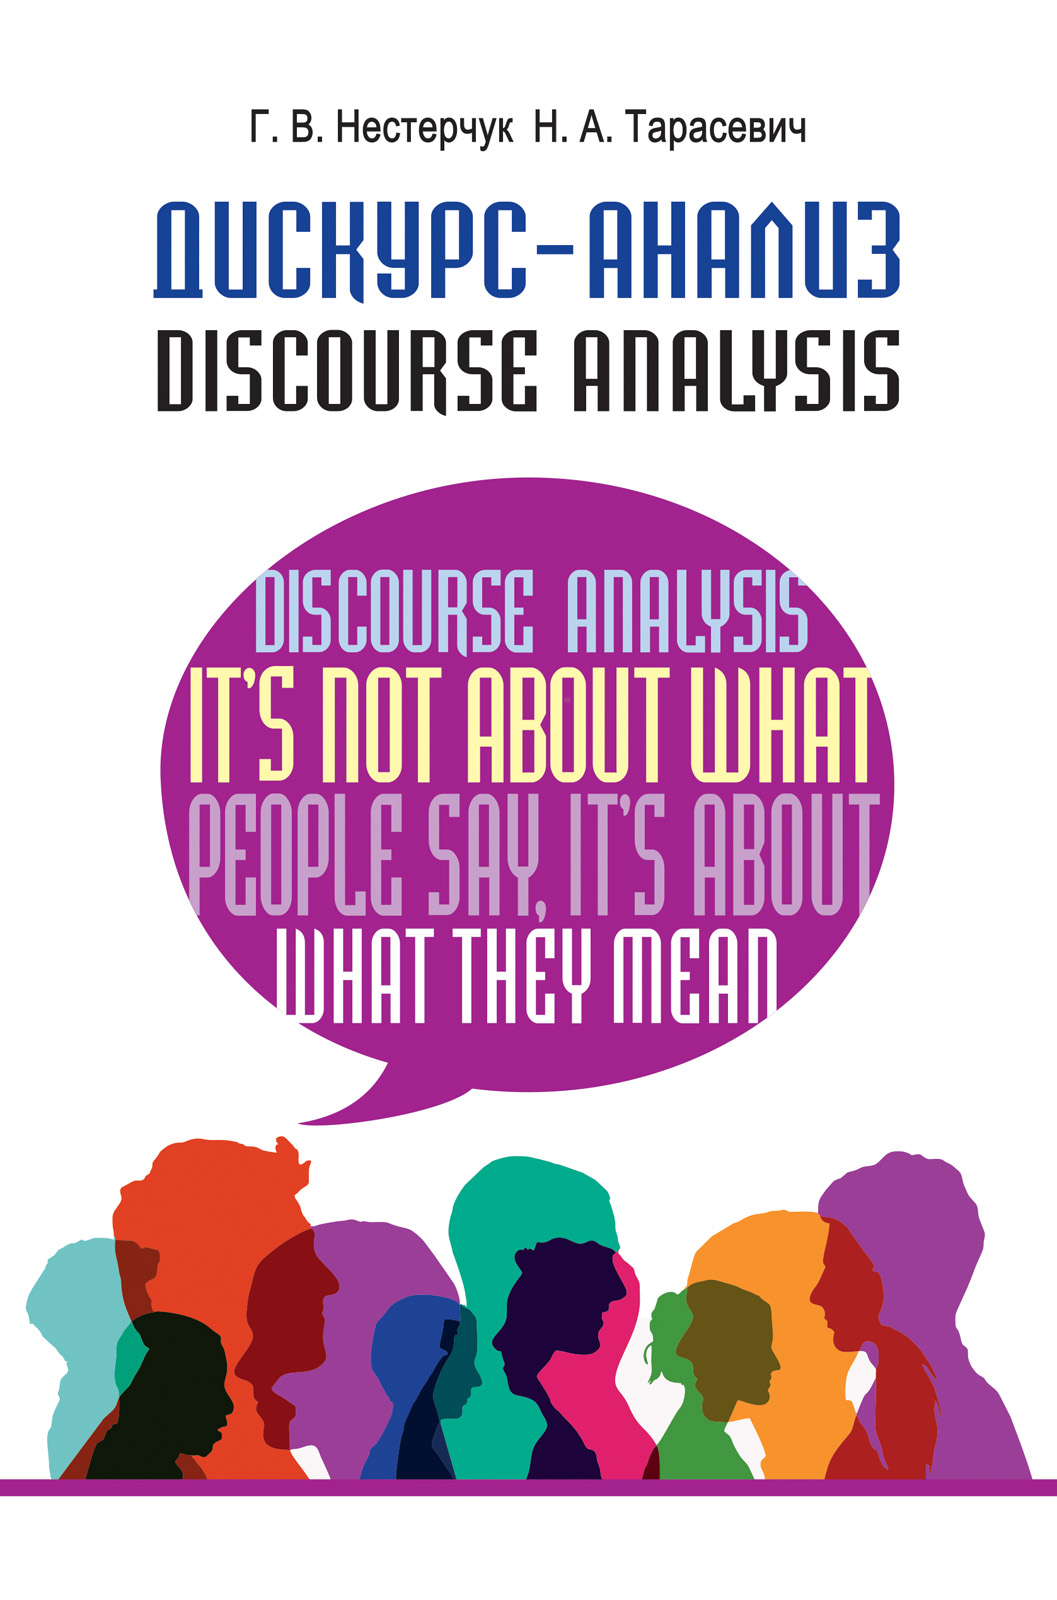 Дискурс-анализ = Discourse Analysis